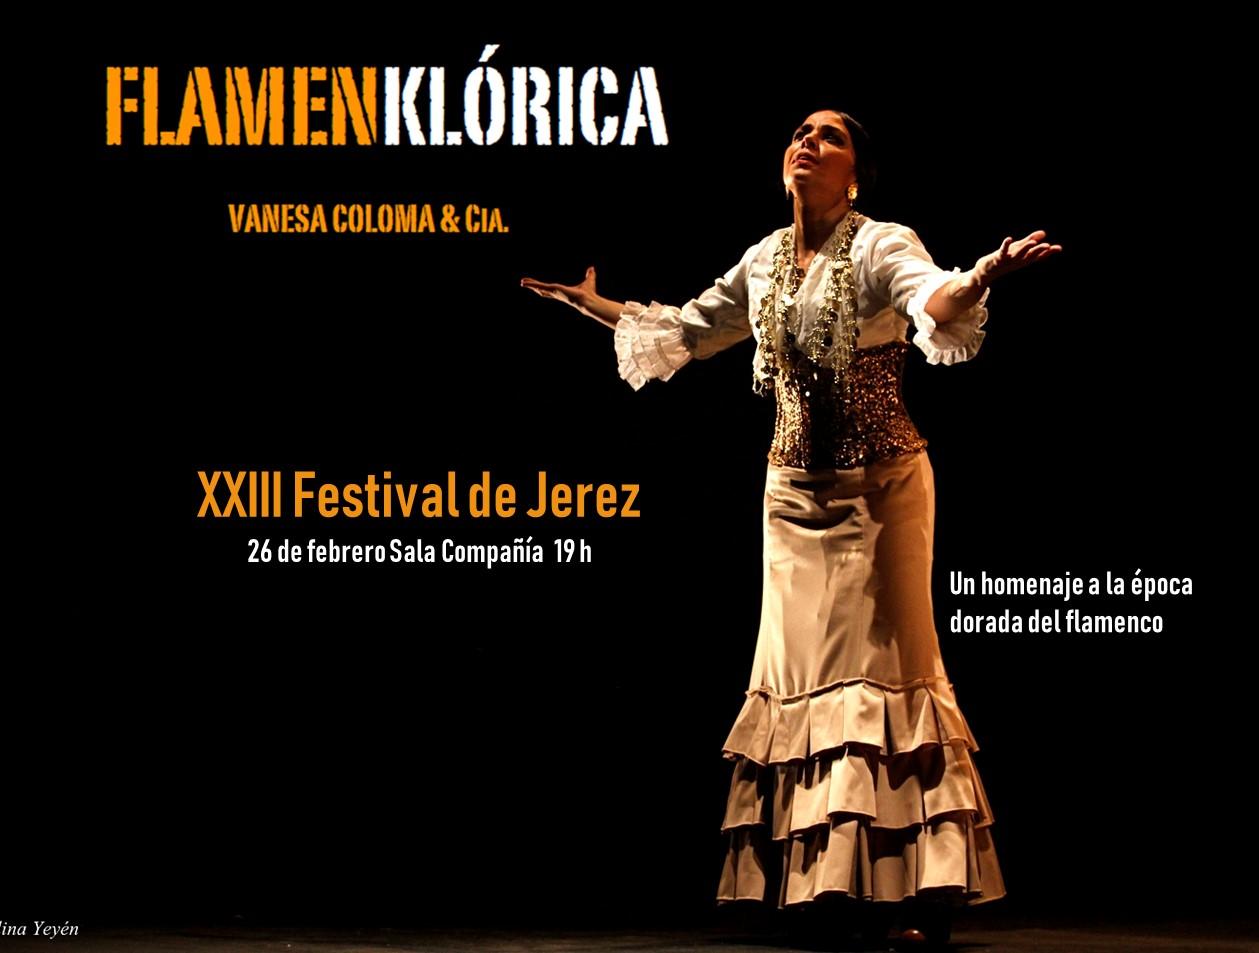 Vanesa Coloma Flamenklorica